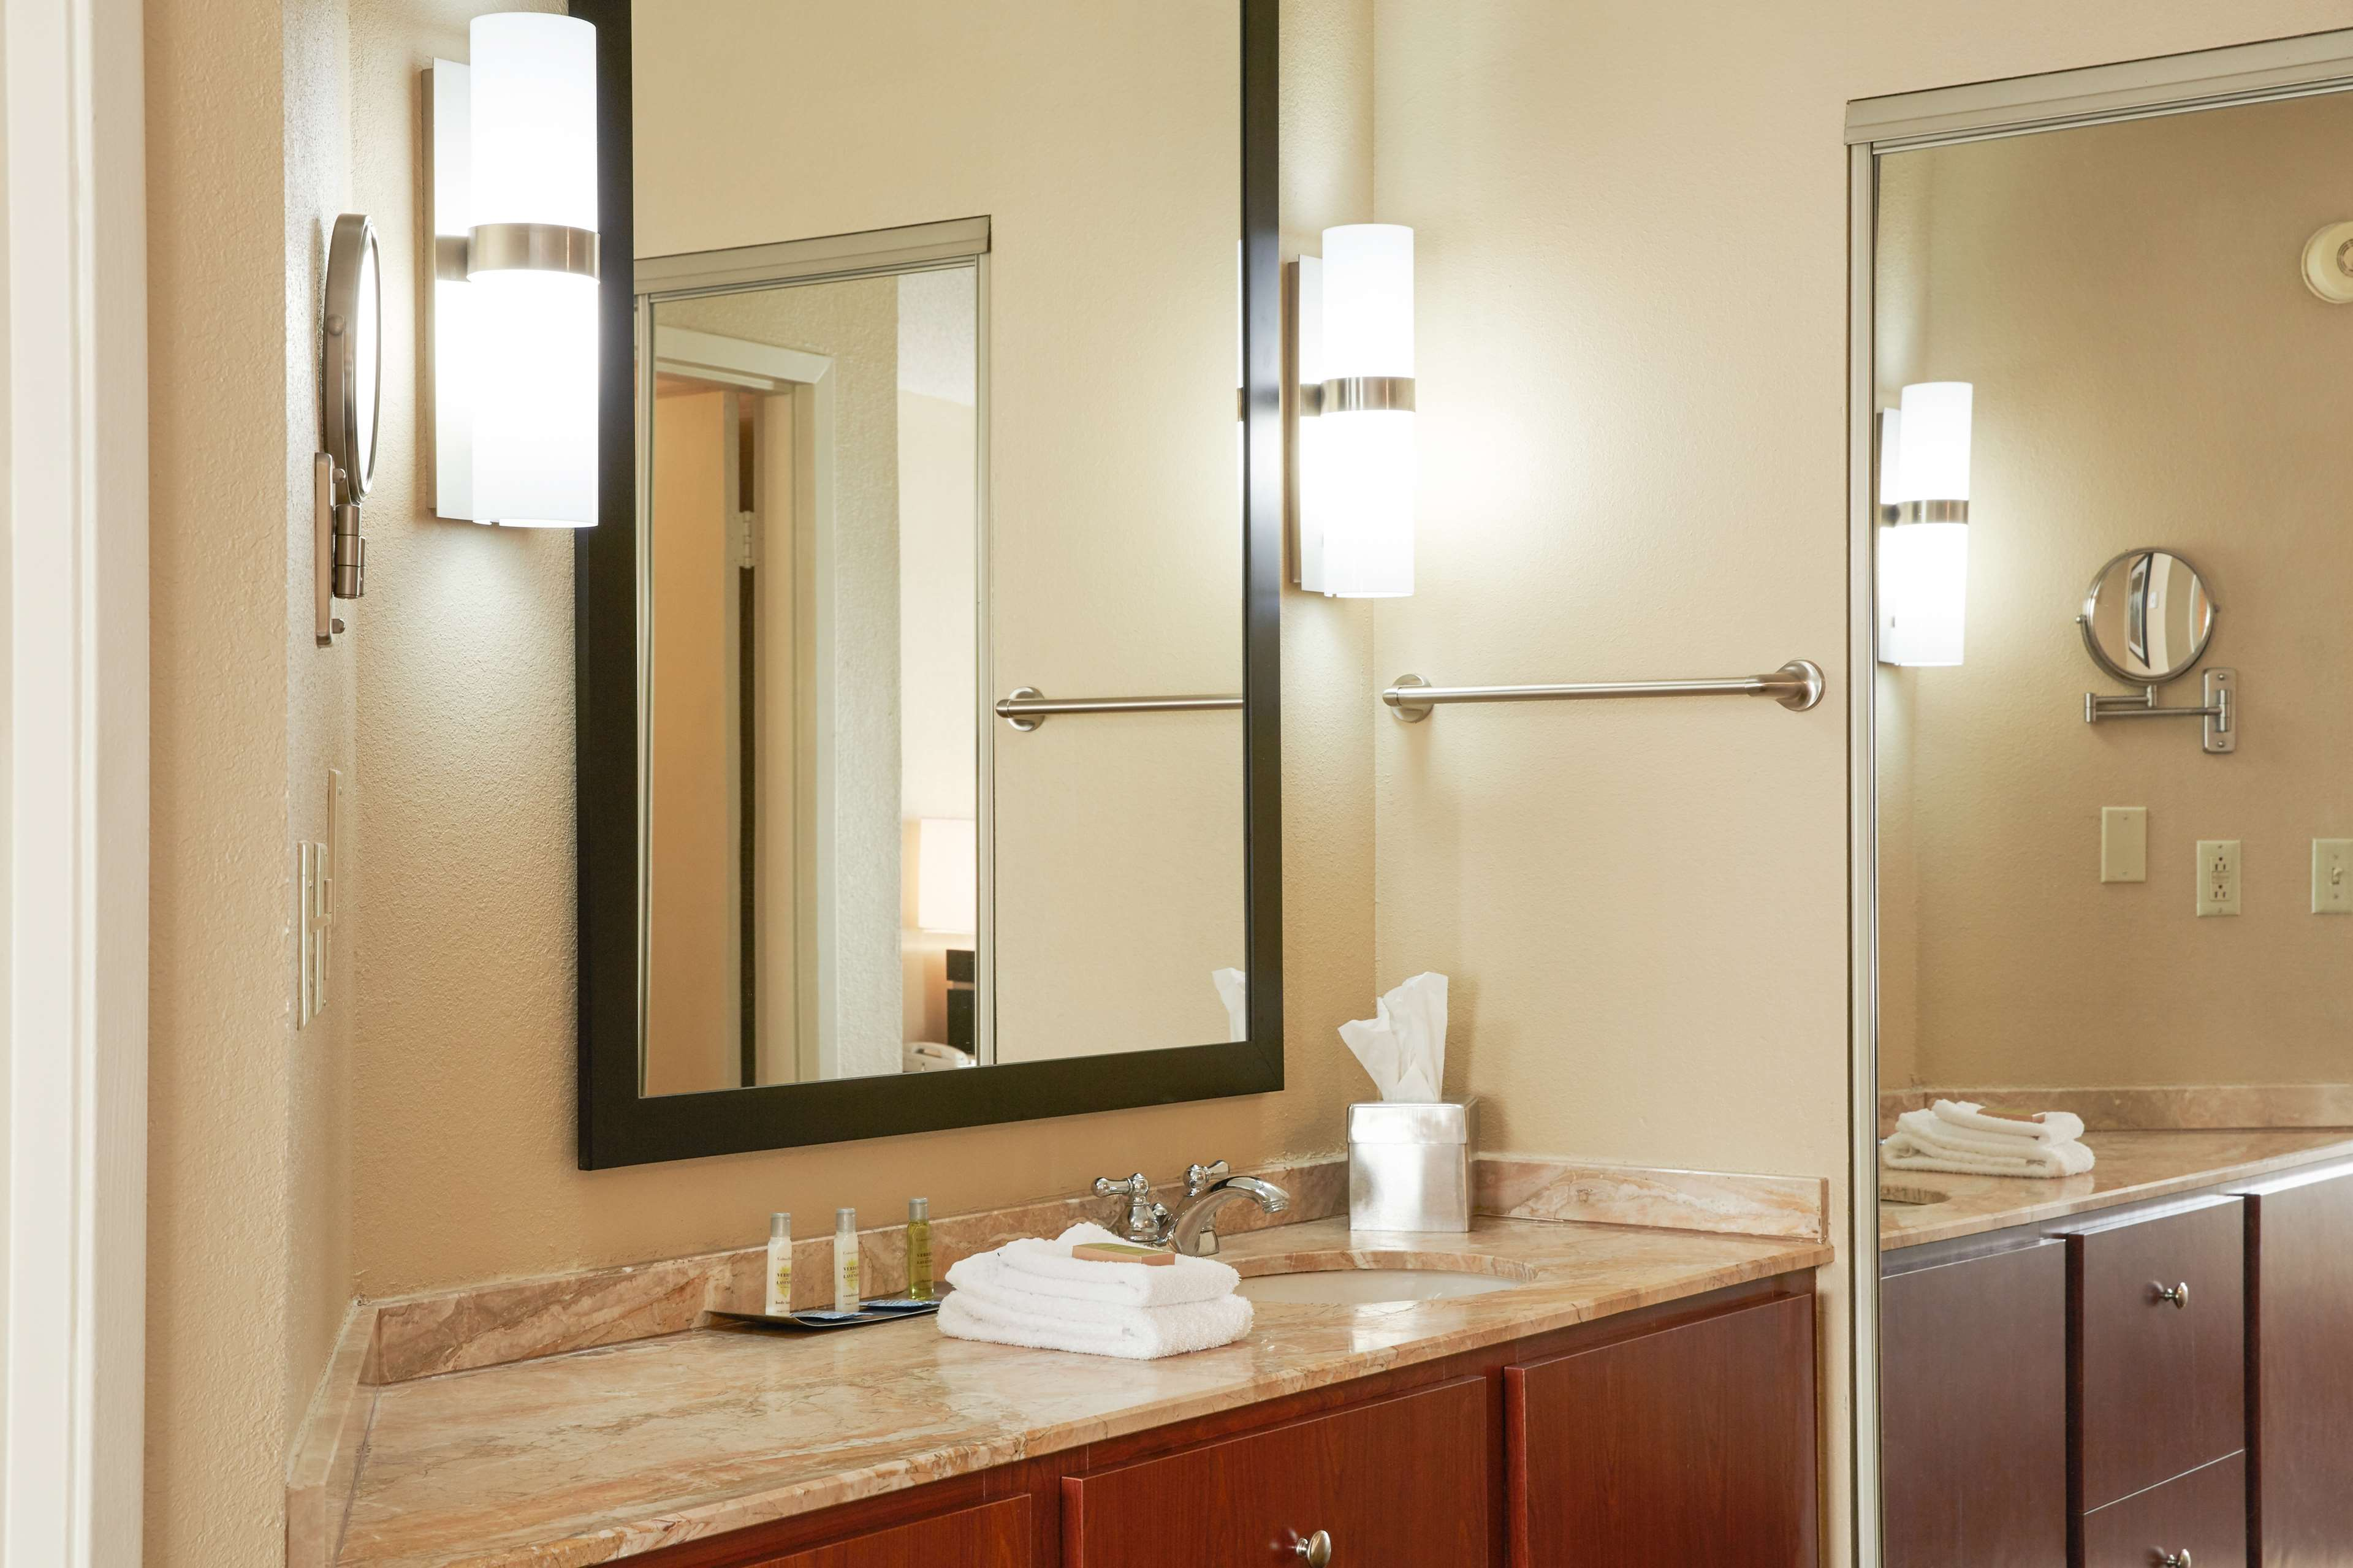 DoubleTree Suites by Hilton Hotel Cincinnati - Blue Ash image 13